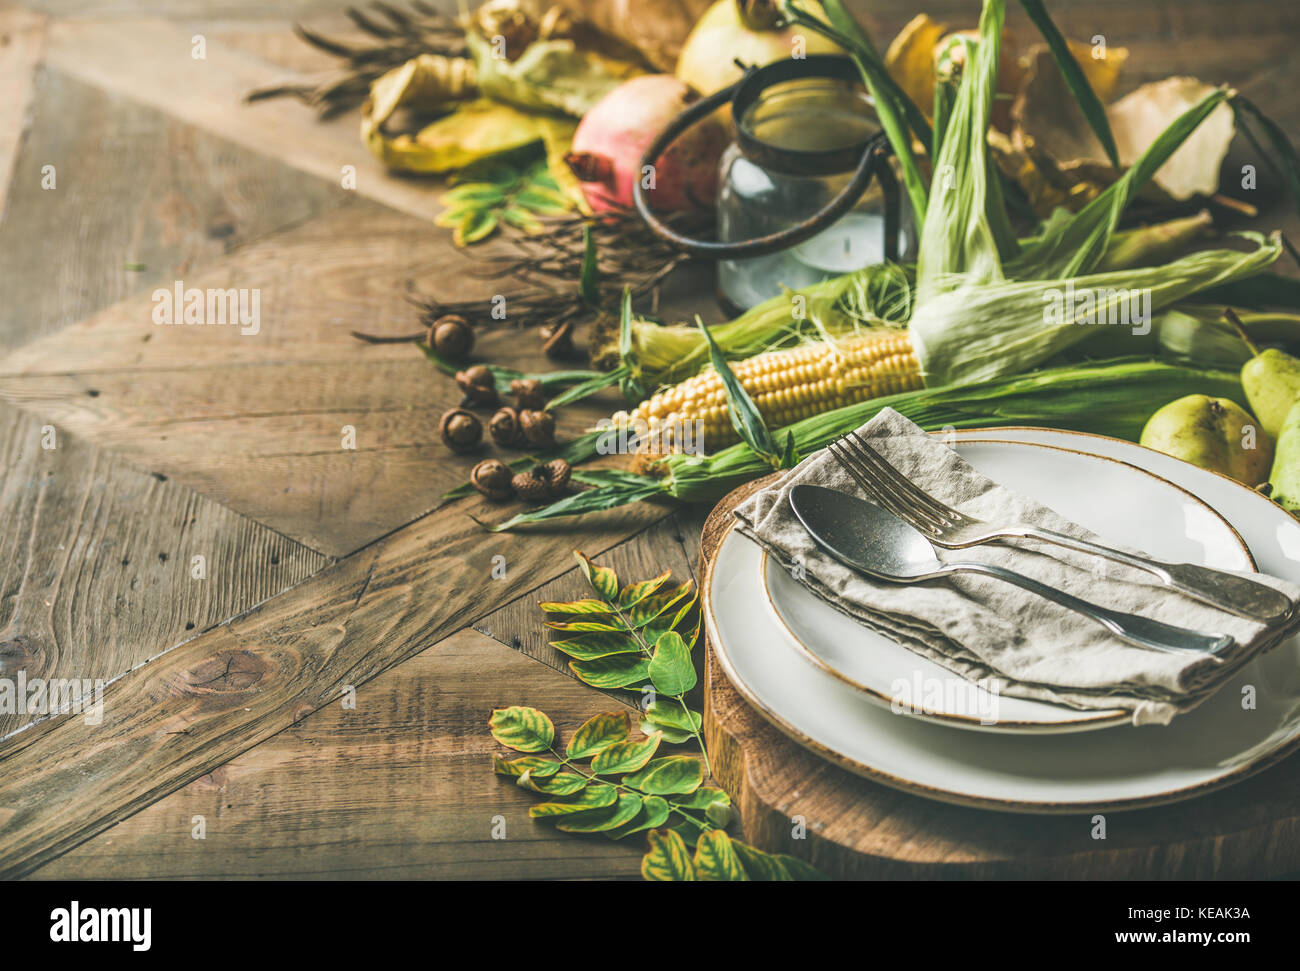 Herbst Tabelle Einstellung für Thanksgiving Day Feier, selektiver Fokus Stockbild